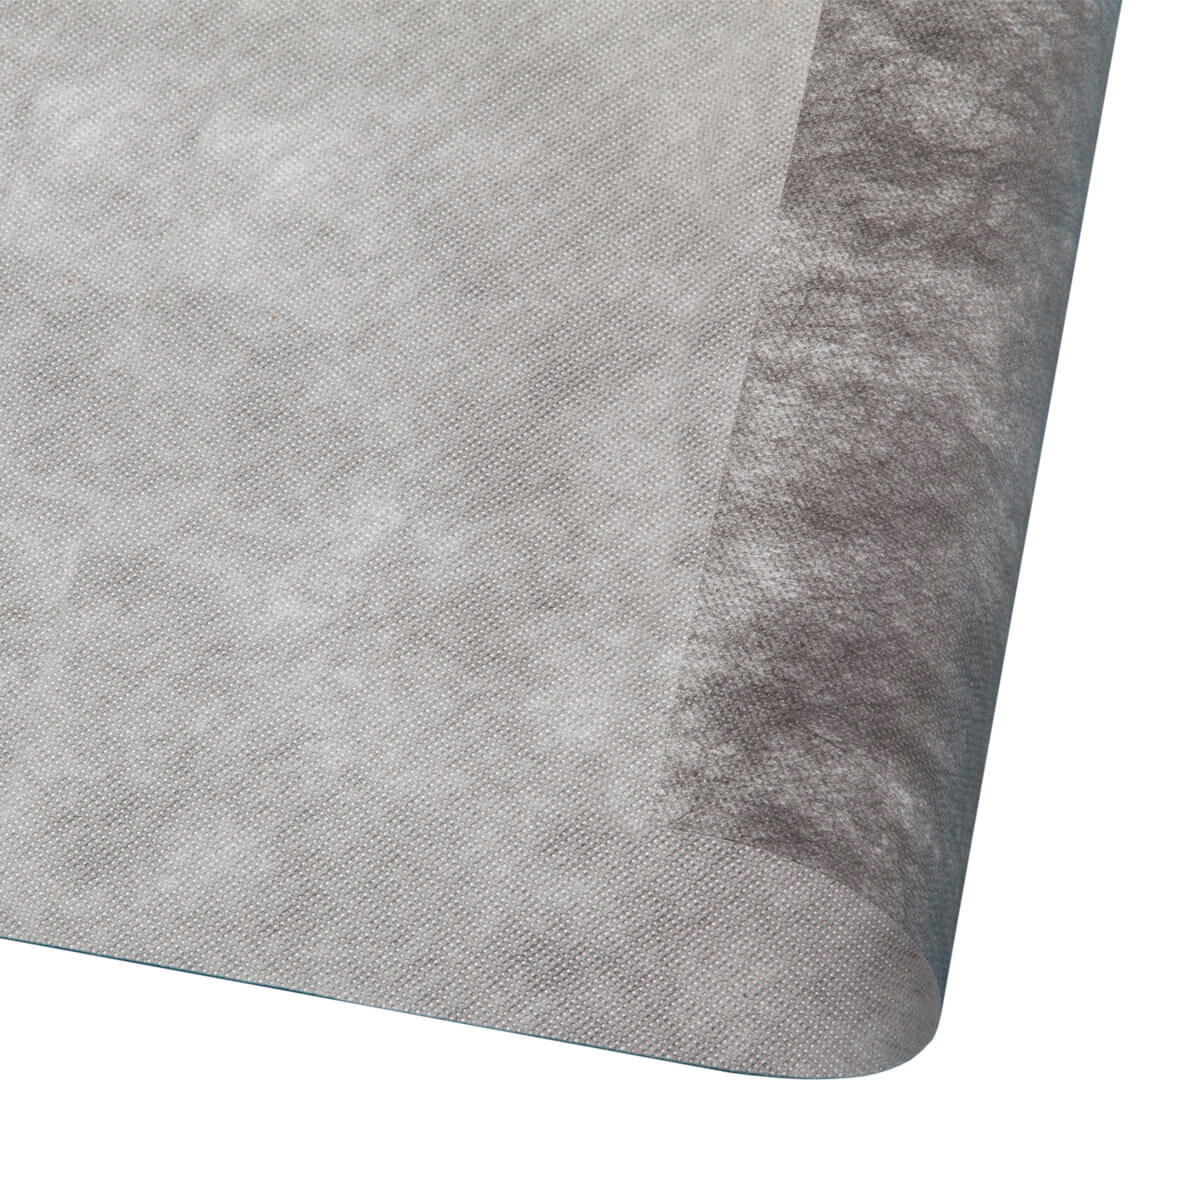 UltraPerm Standard Roll Edge